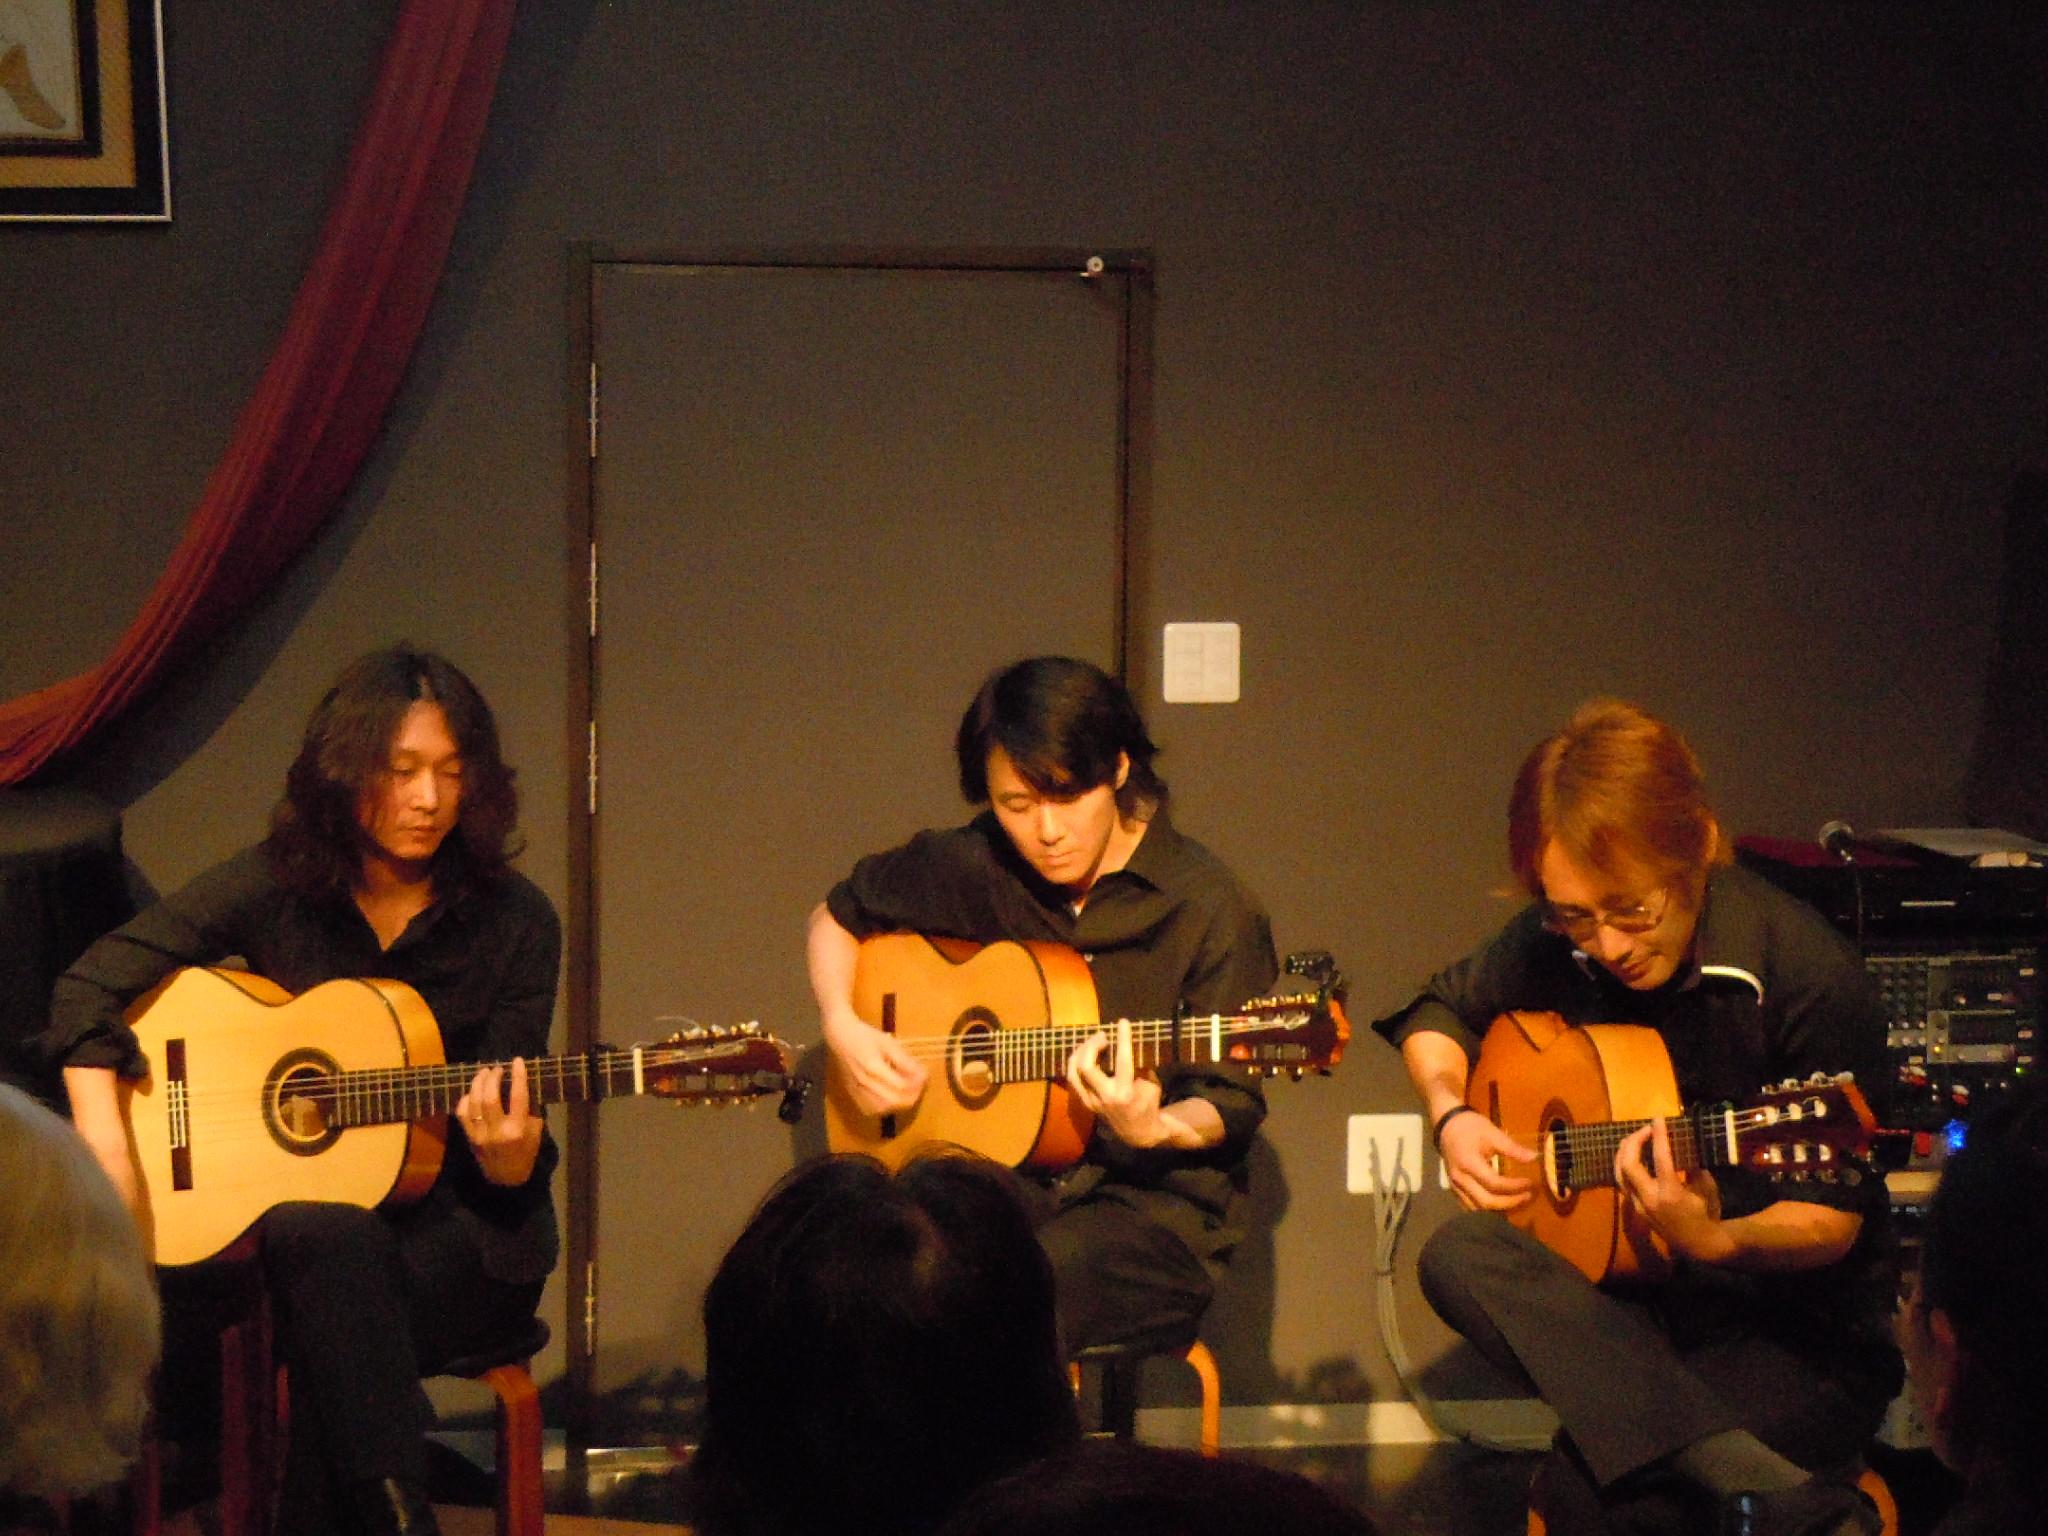 http://chanter-yachiyo.com/2011/10/30/2011_1029_145042-DSCN1556.JPG